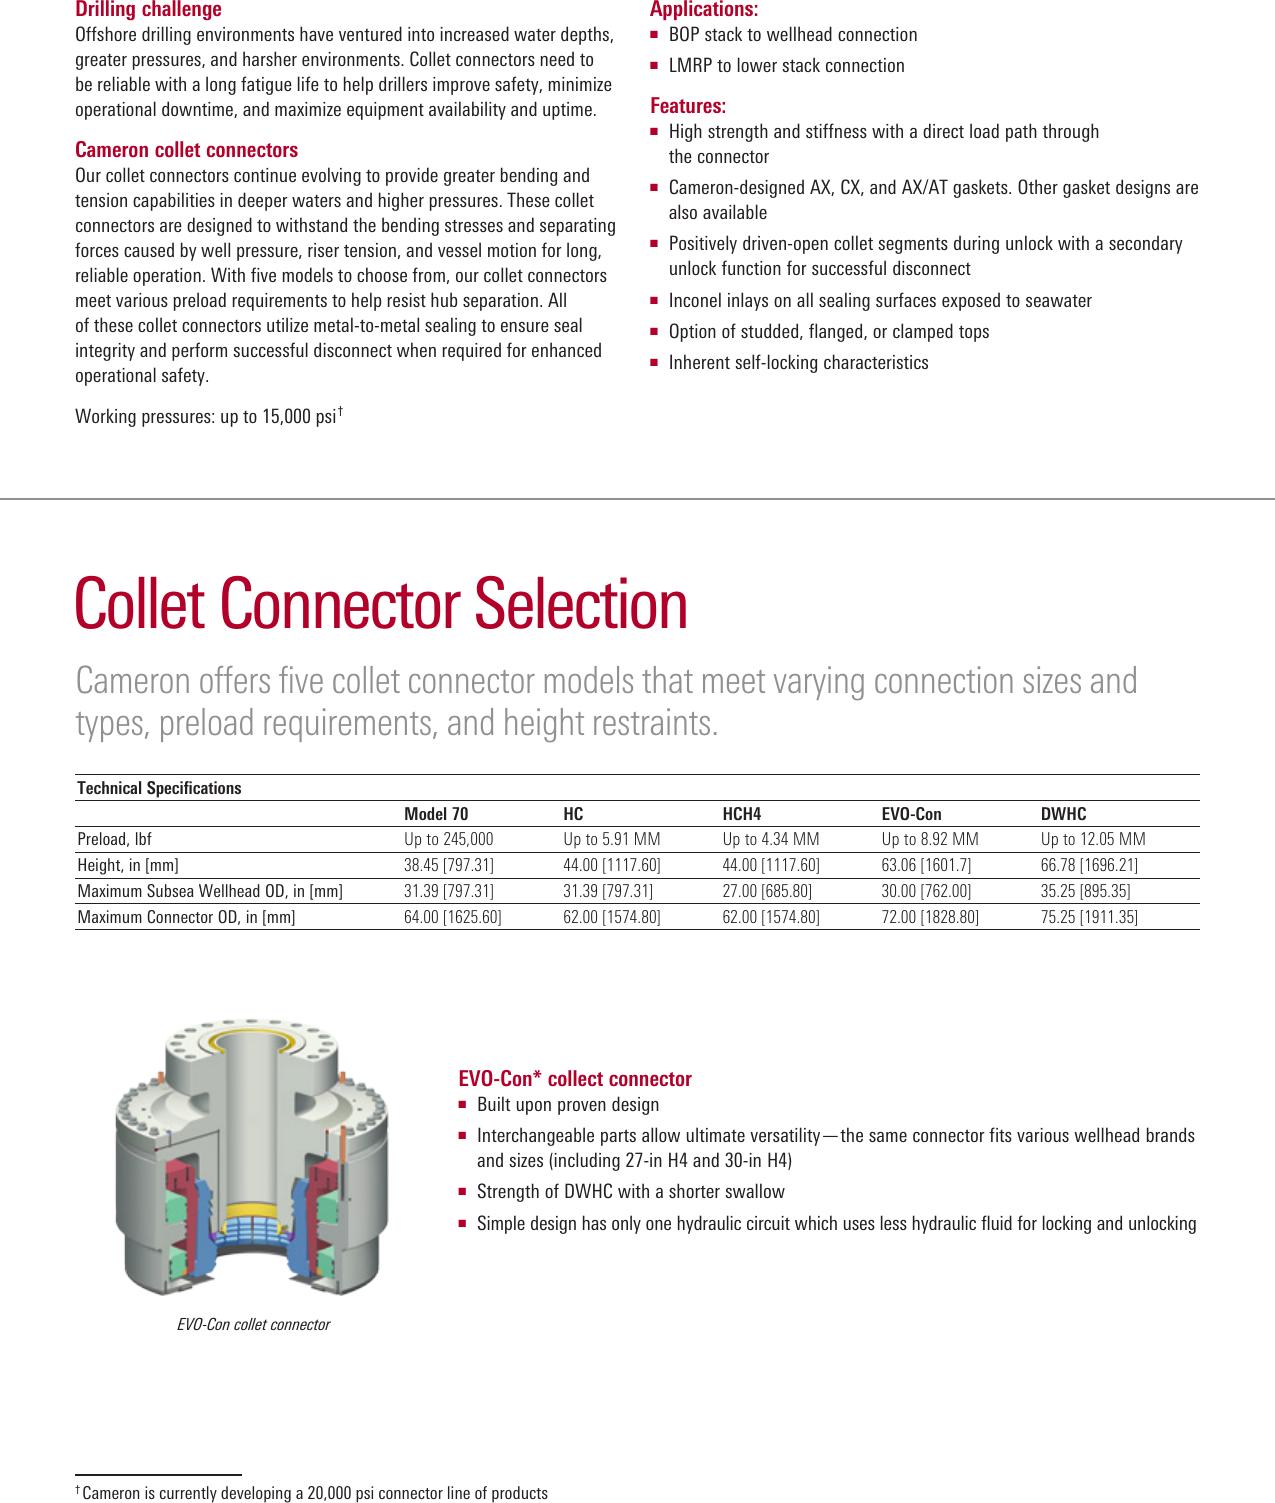 Collet Connectors For BOP Stacks connector brochure